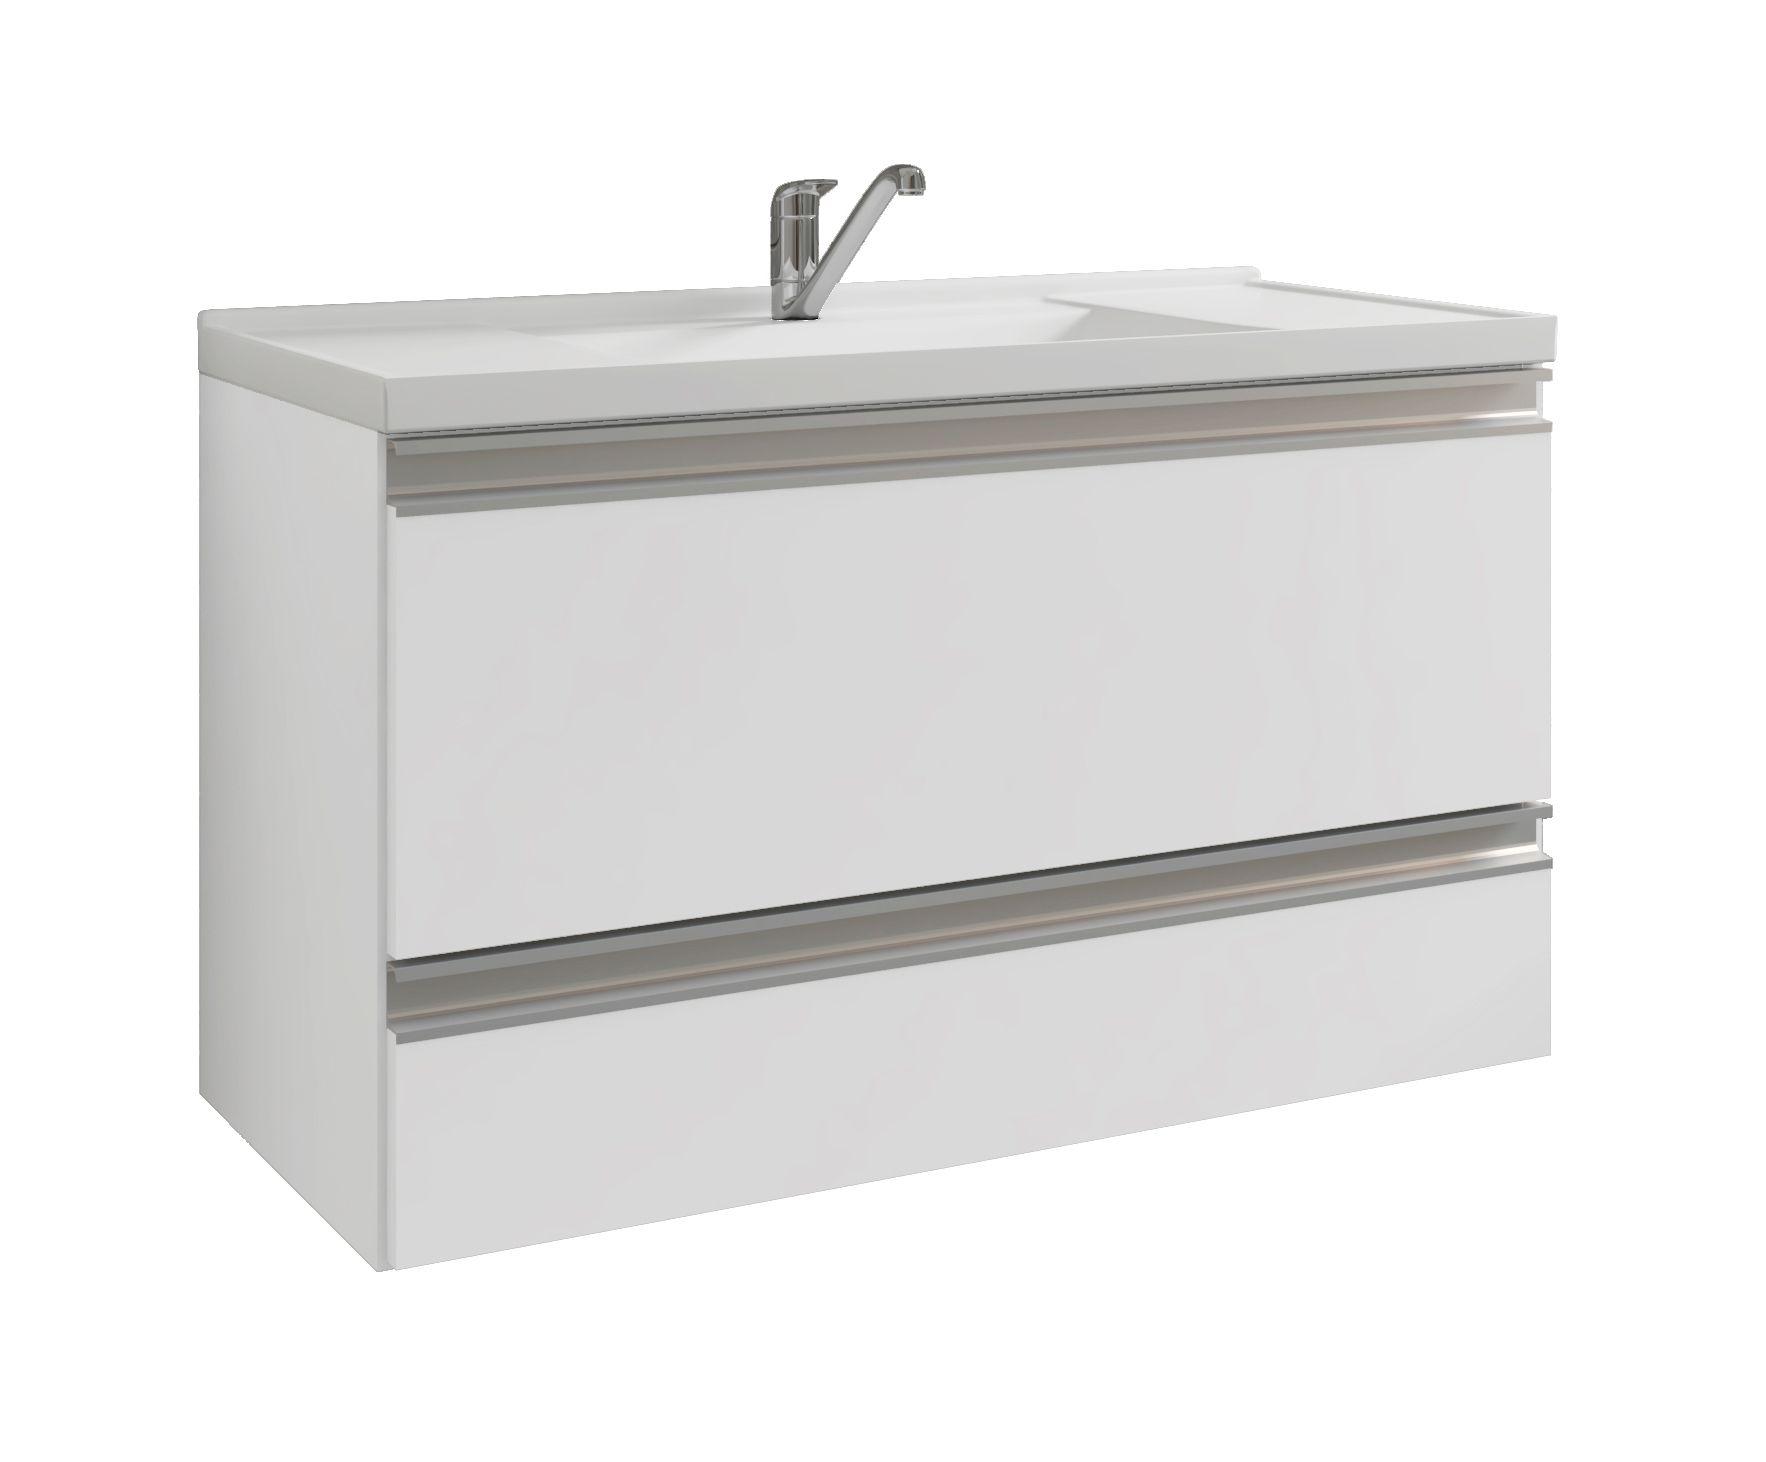 Gabinete Para Banheiro Treviso 79 Cm PX Perfil MGM Móveis Branco